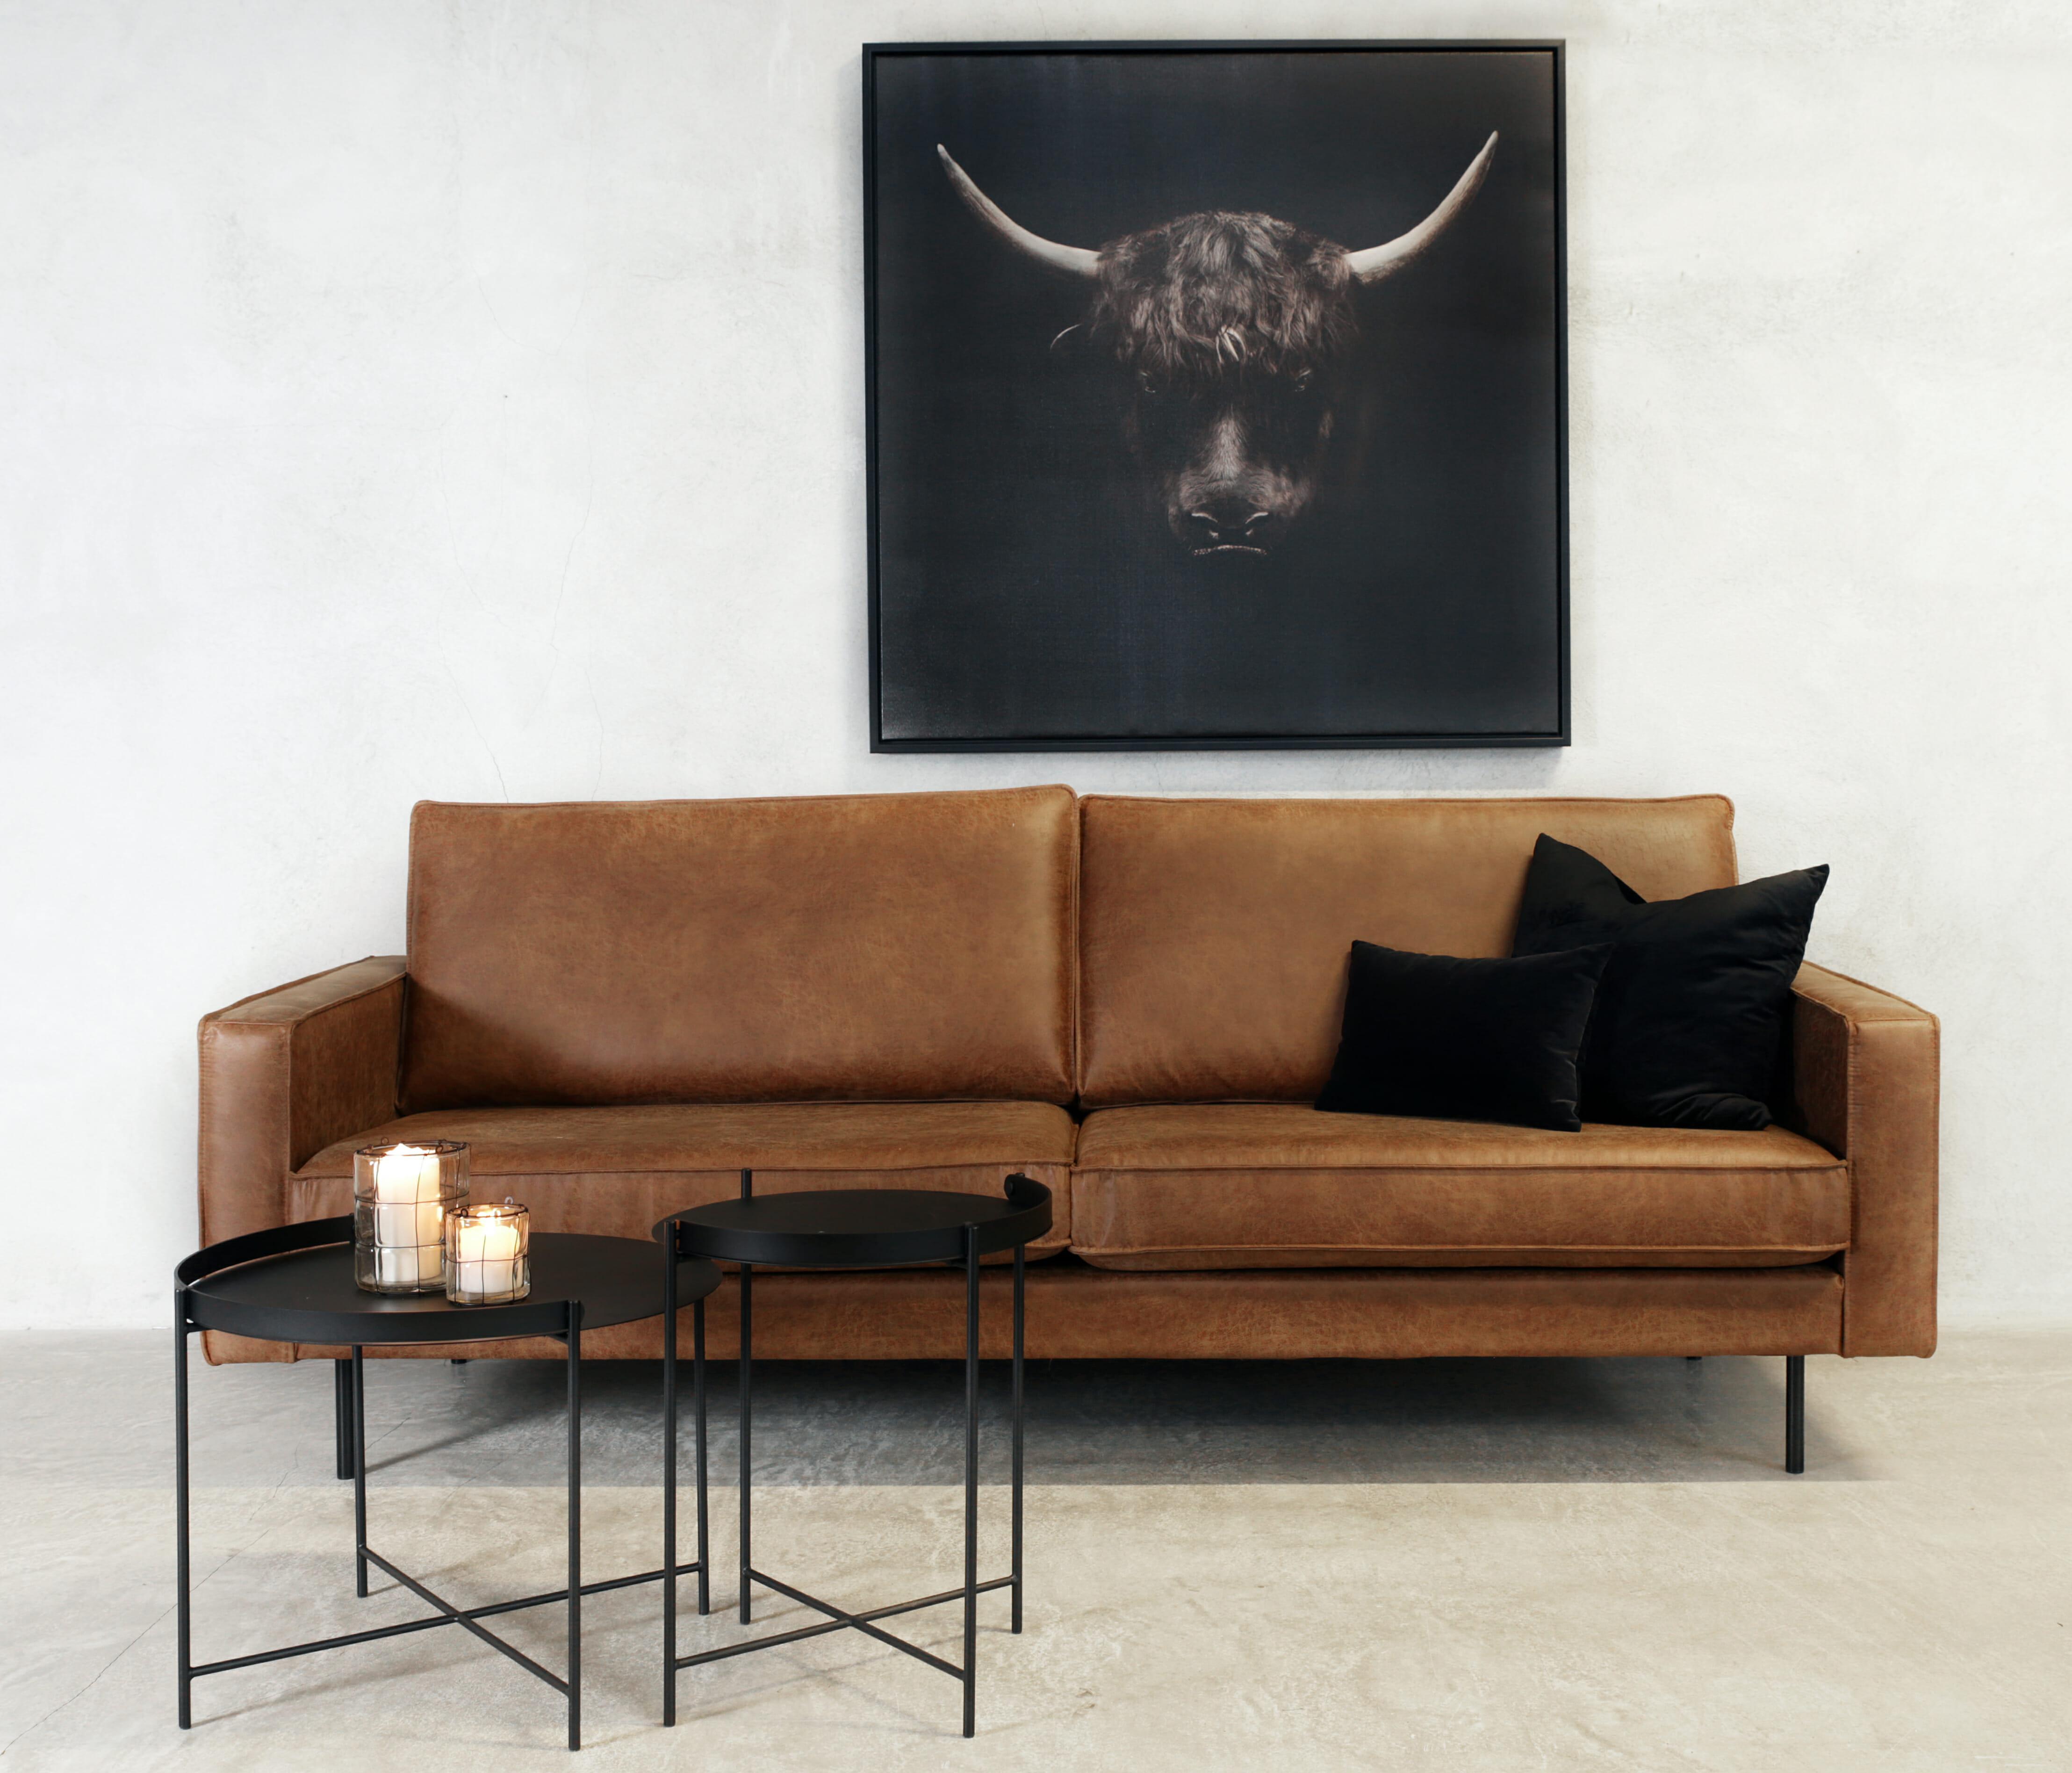 Roya 4 seter sofa Eco-hud HFbilde, On th emove bord 3 zoom